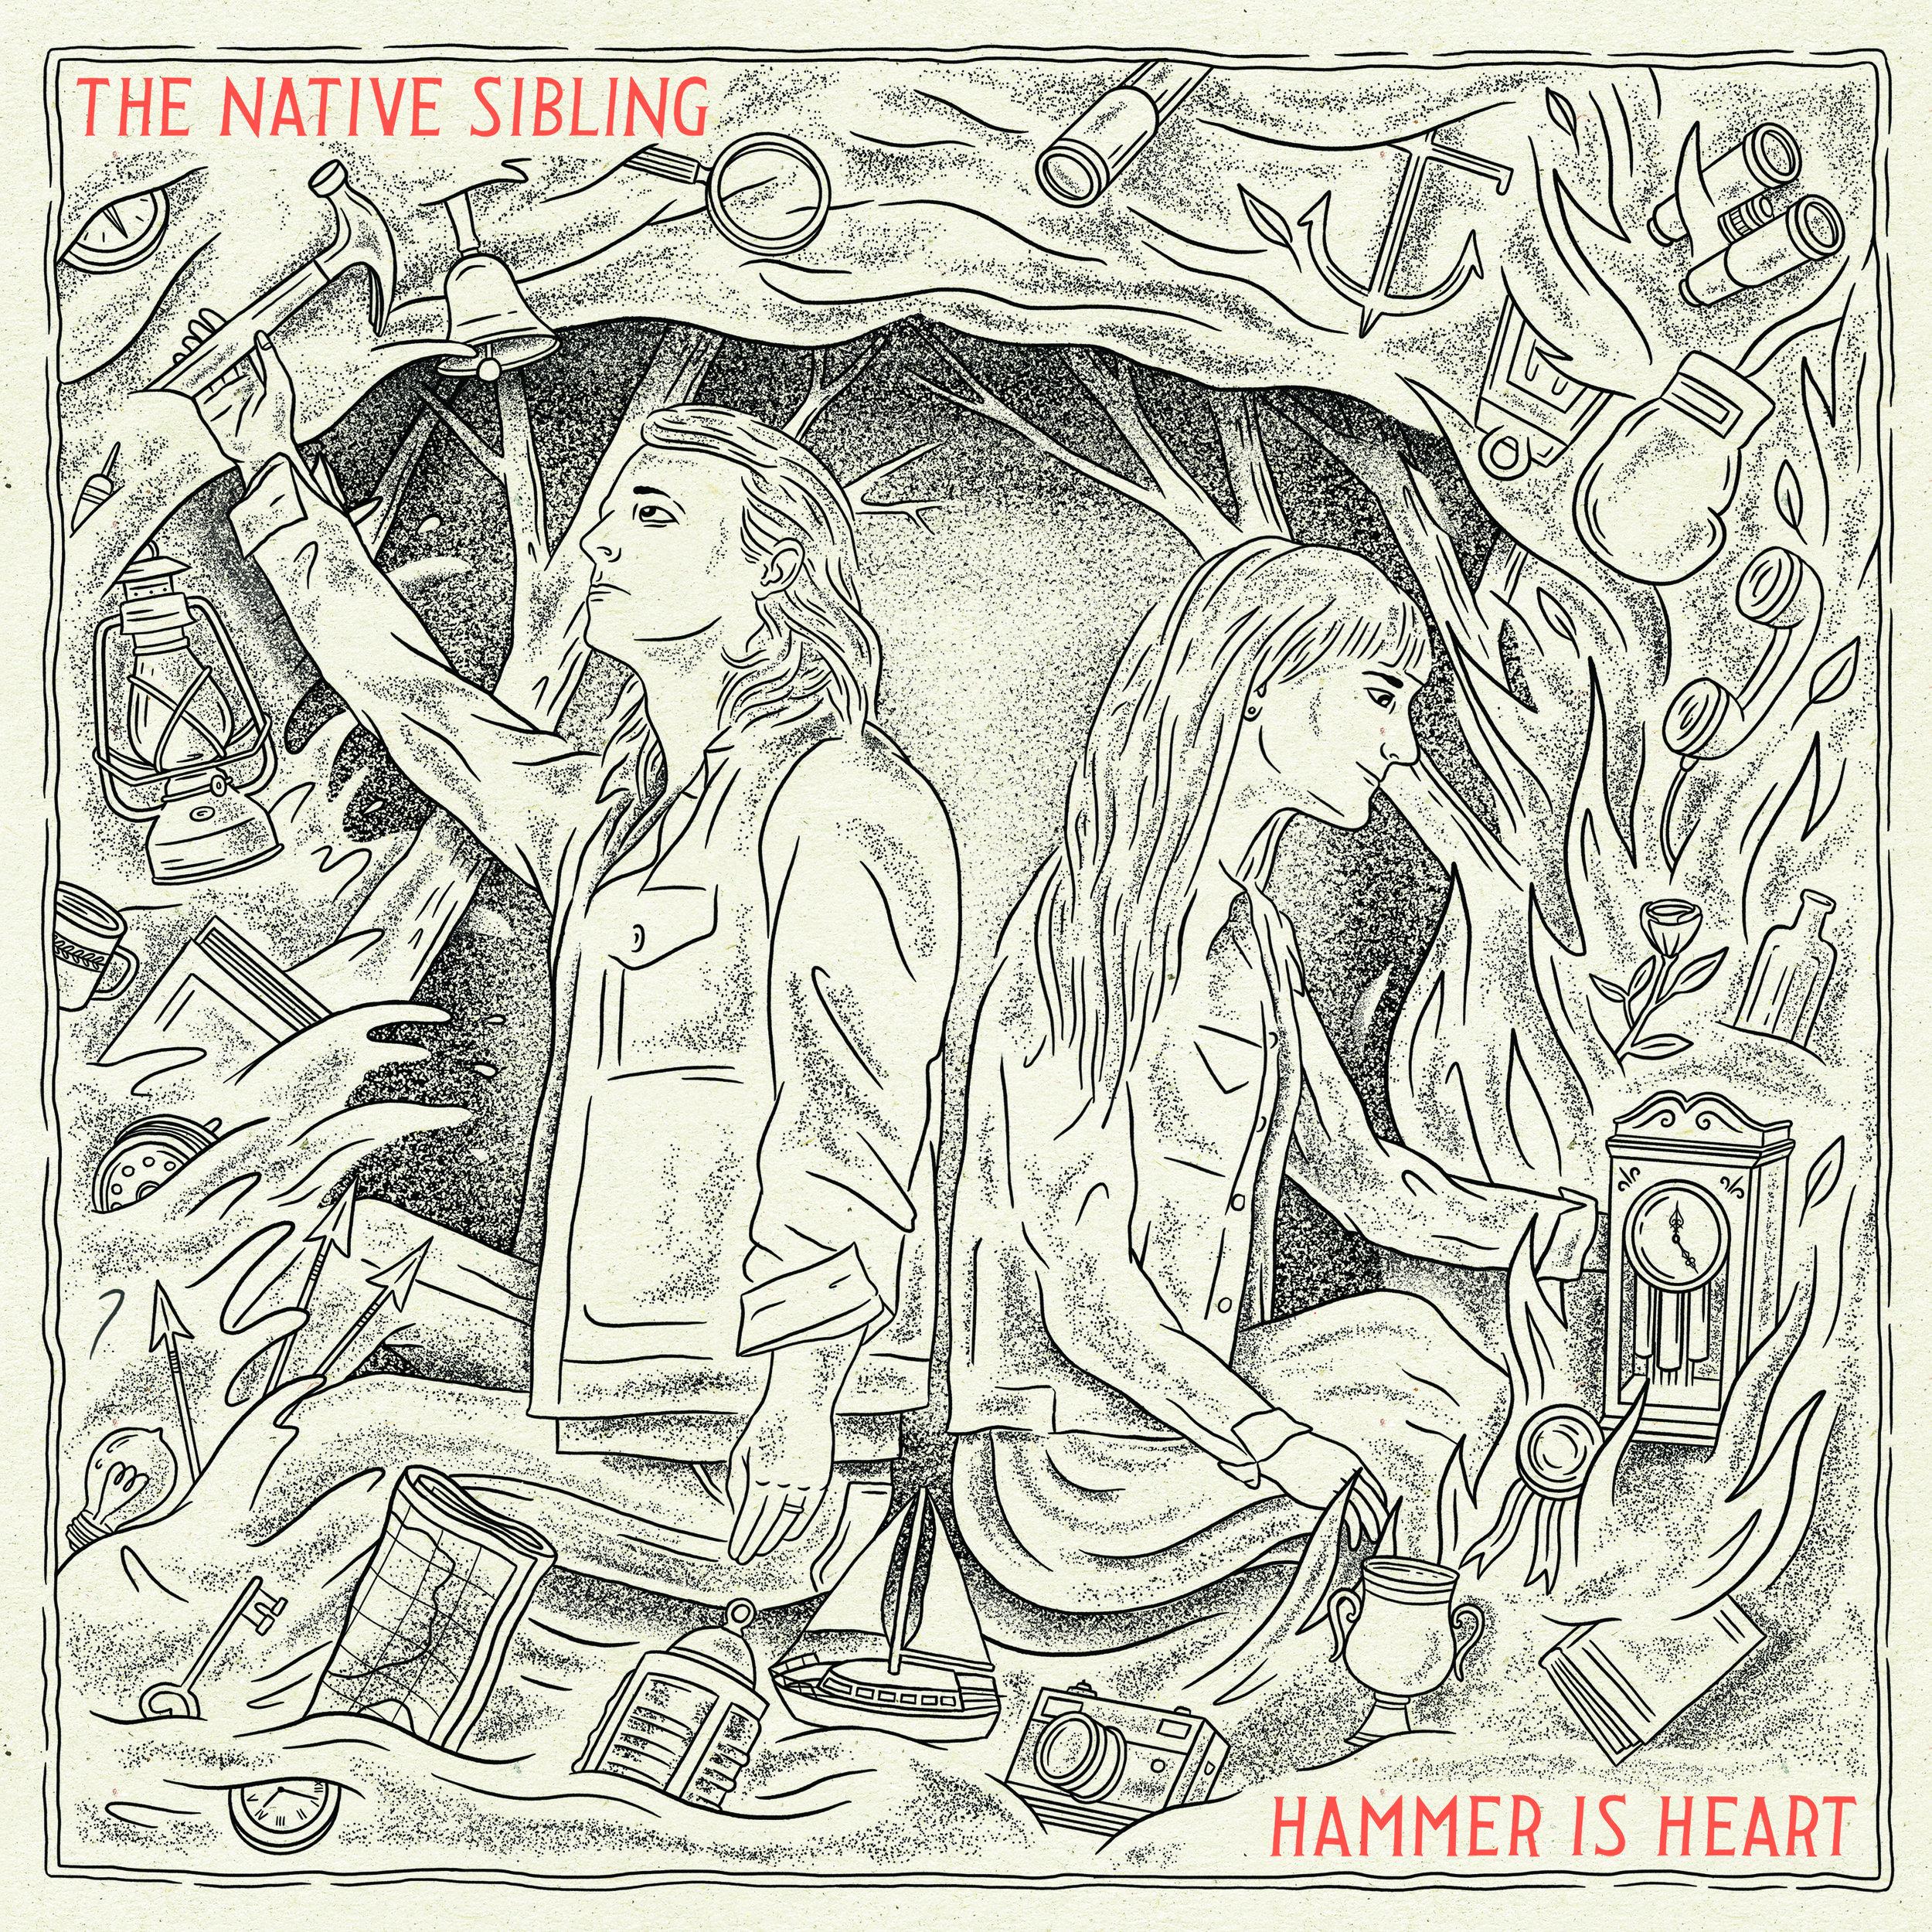 HammerIsHeart-TheNativeSiblingAlbumArt (Digital Sizing).jpg